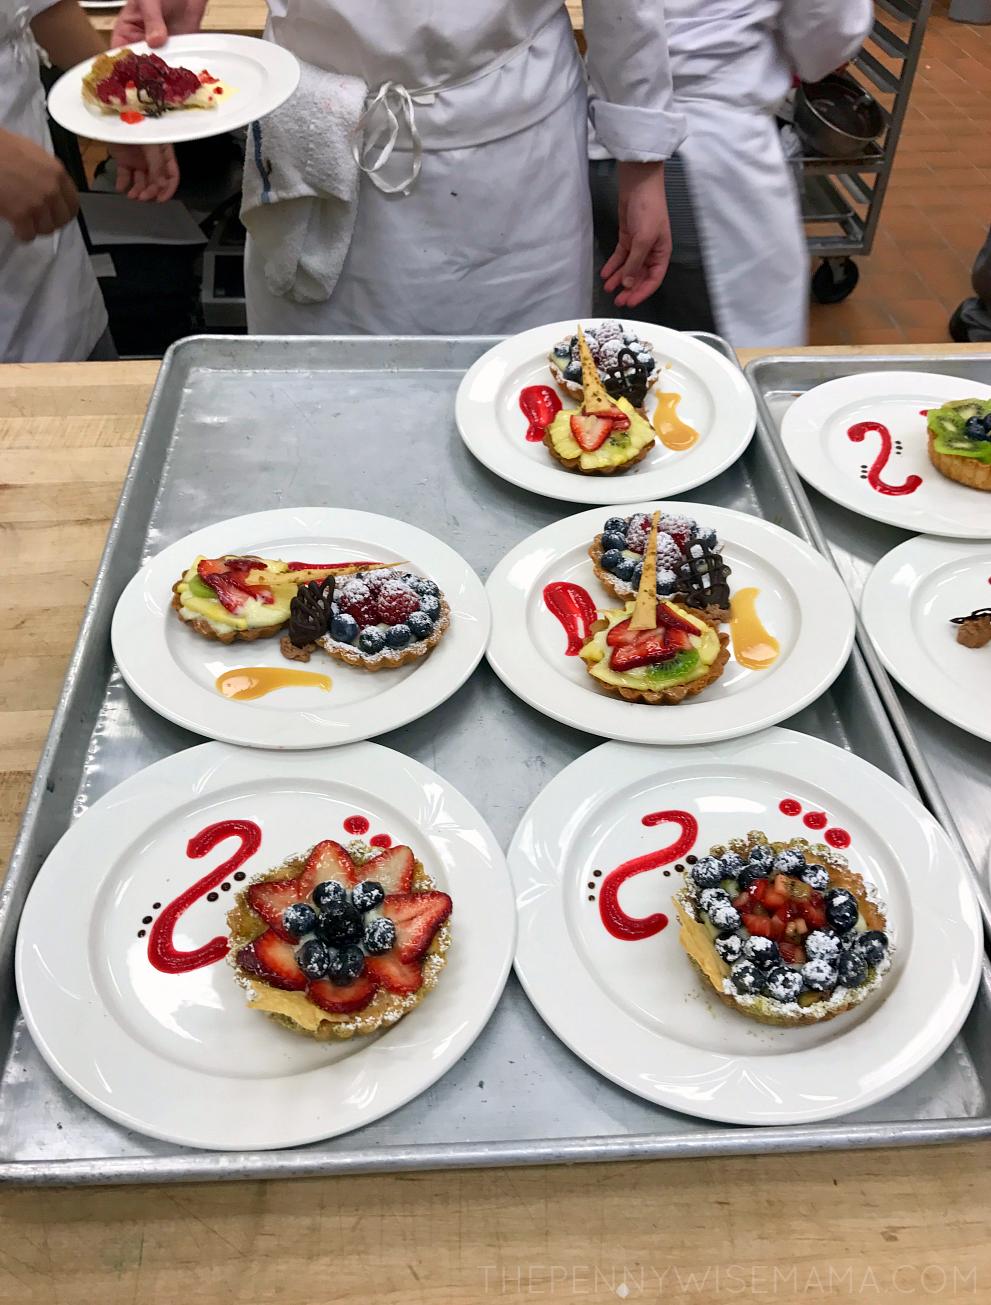 Culinary School at JWU Denver